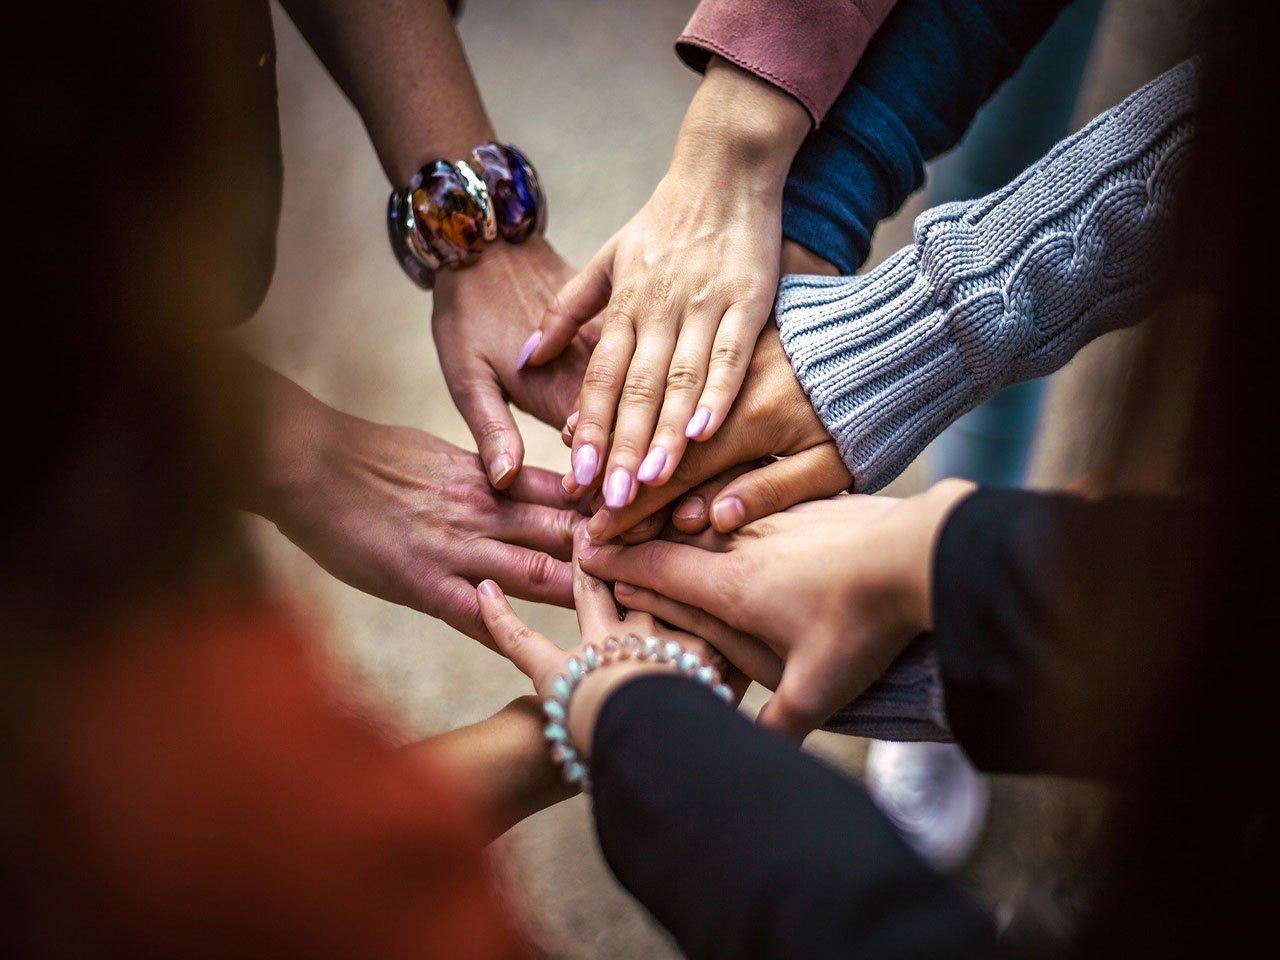 Advocates-create-Canada-wide-support-list-for-sexual-assault-survivors-Hanson-&-Co